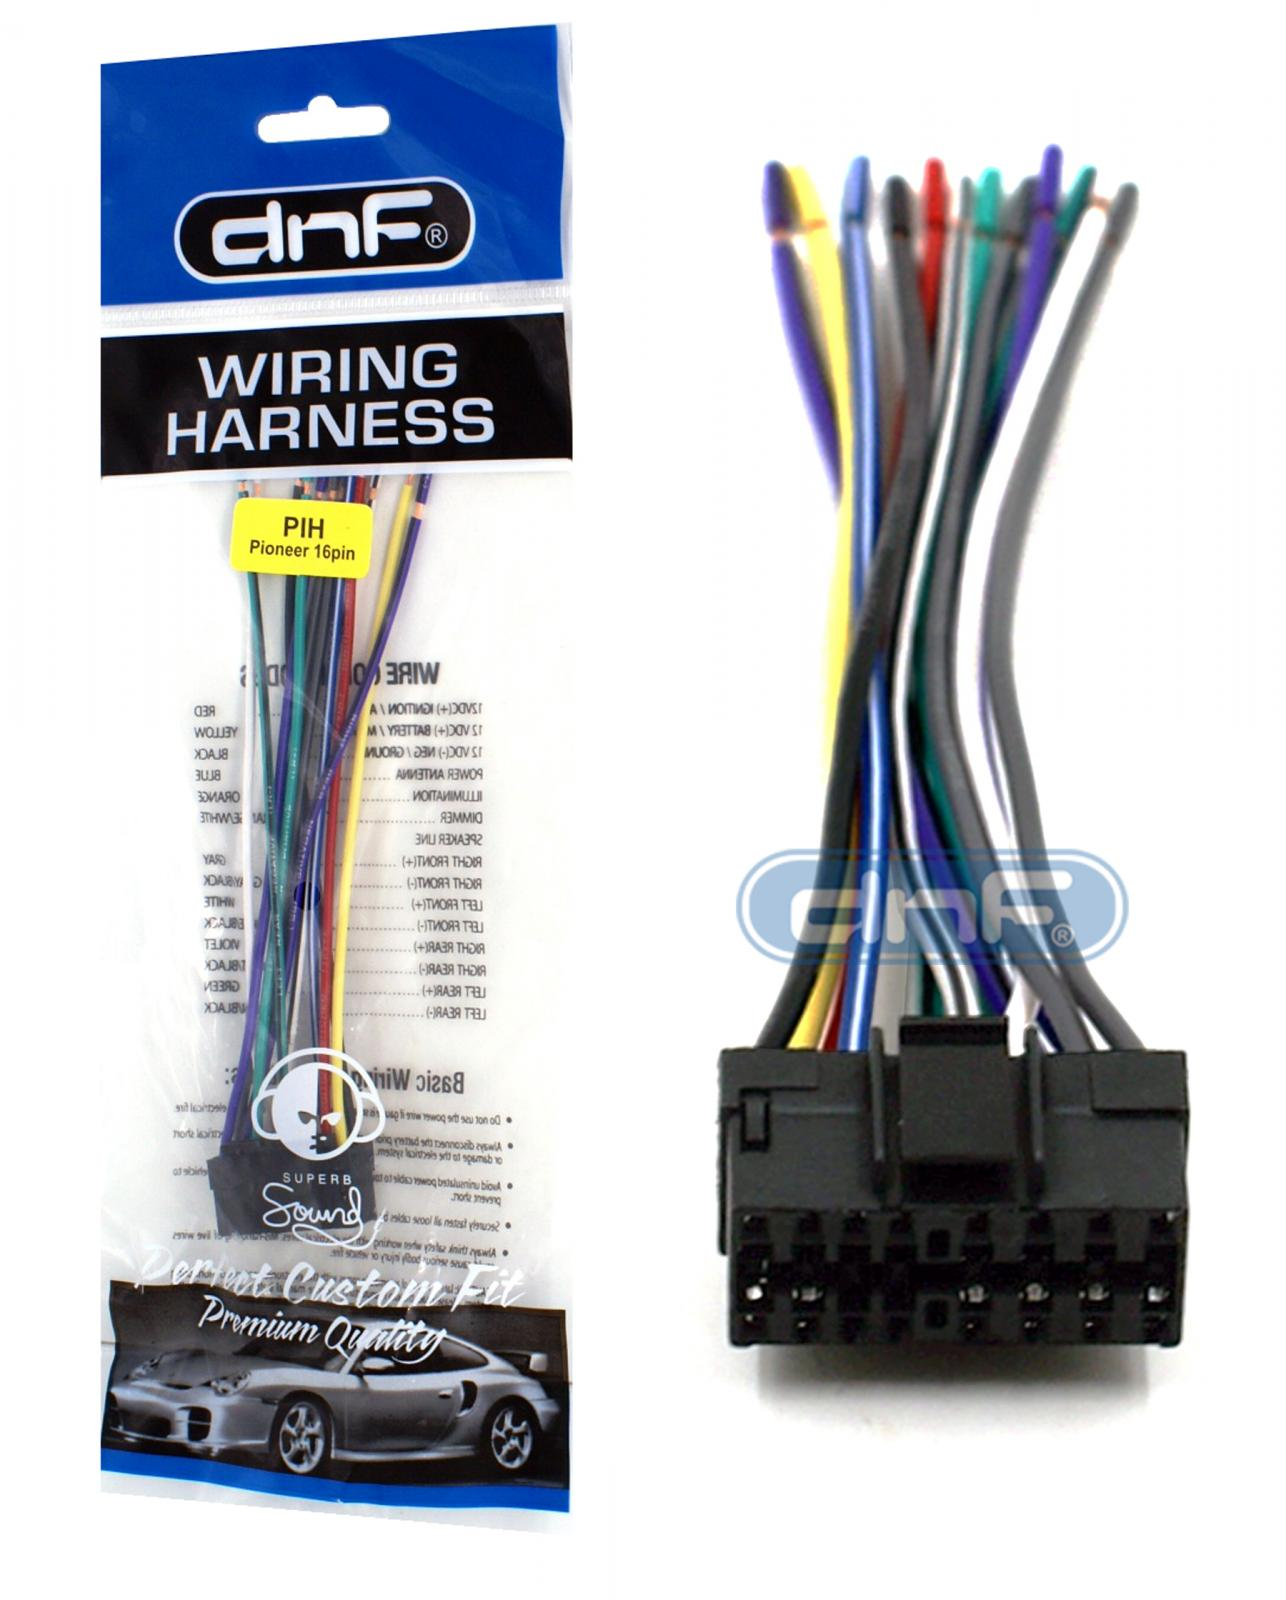 Radio Wiring Diagram 7 Wire Trailer Wiring Diagram Pioneer Deh Wiring